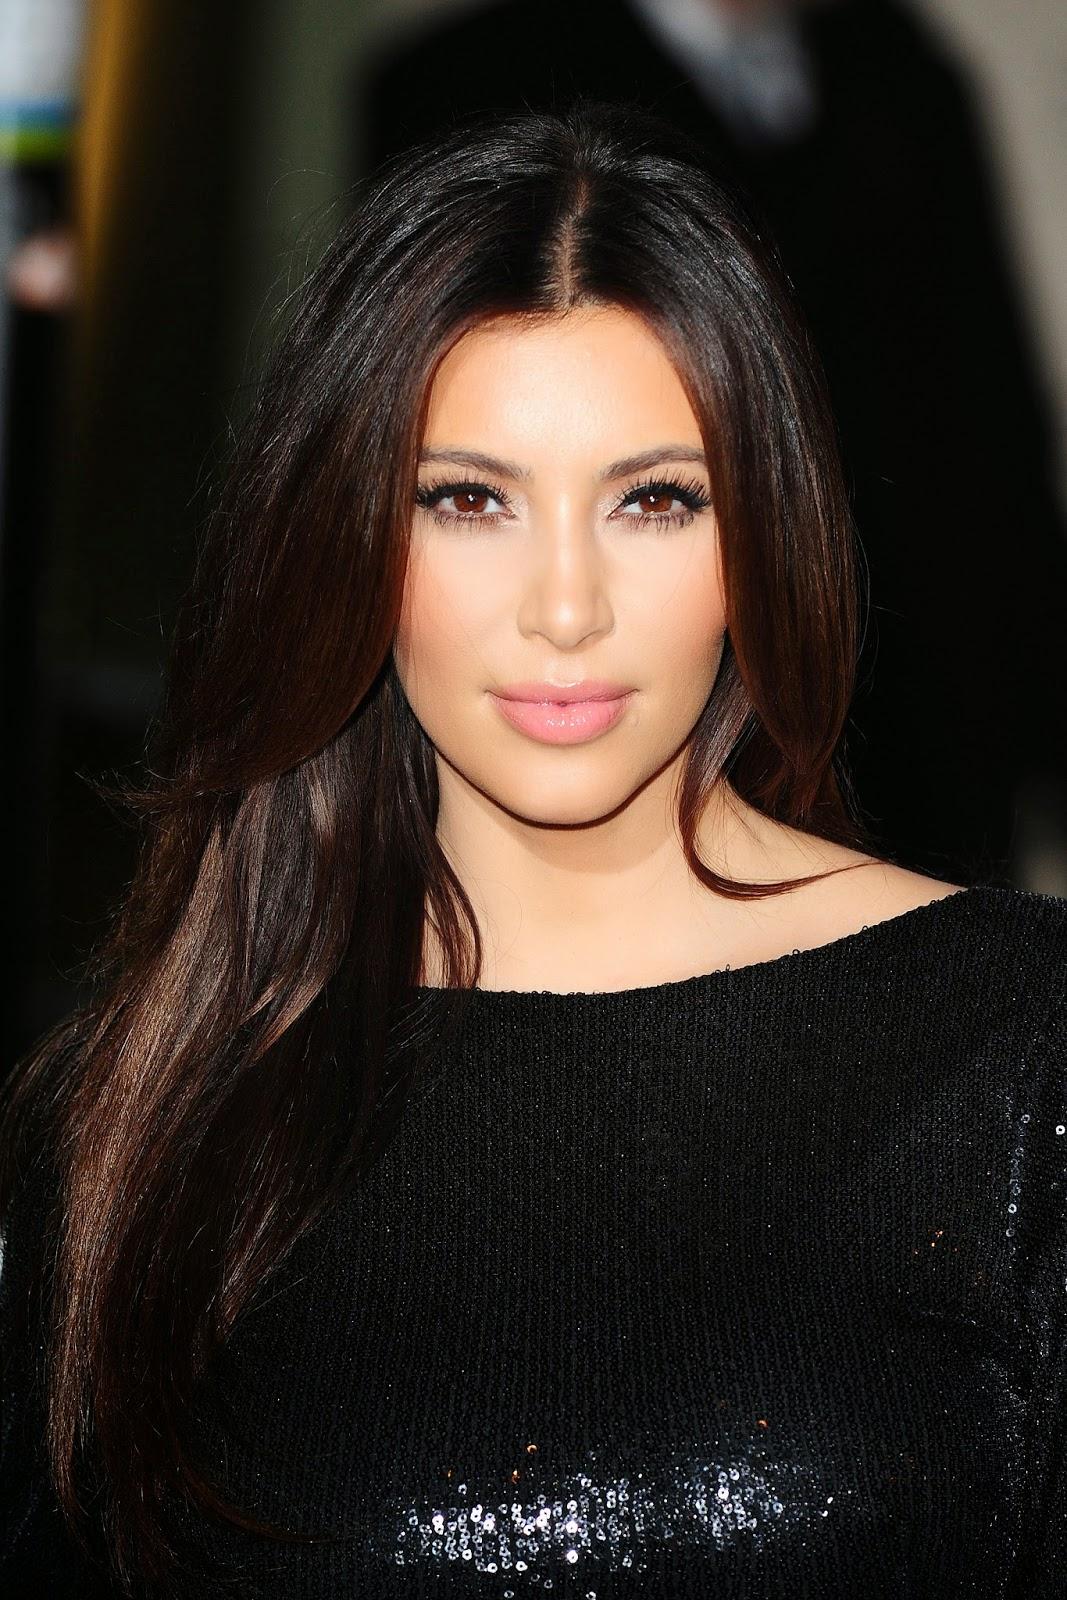 Kim Kardashian Interviews Kylie Jenner About Her Best: Sports Scandal: Kim Kardashian: No Plastic Surgery Or